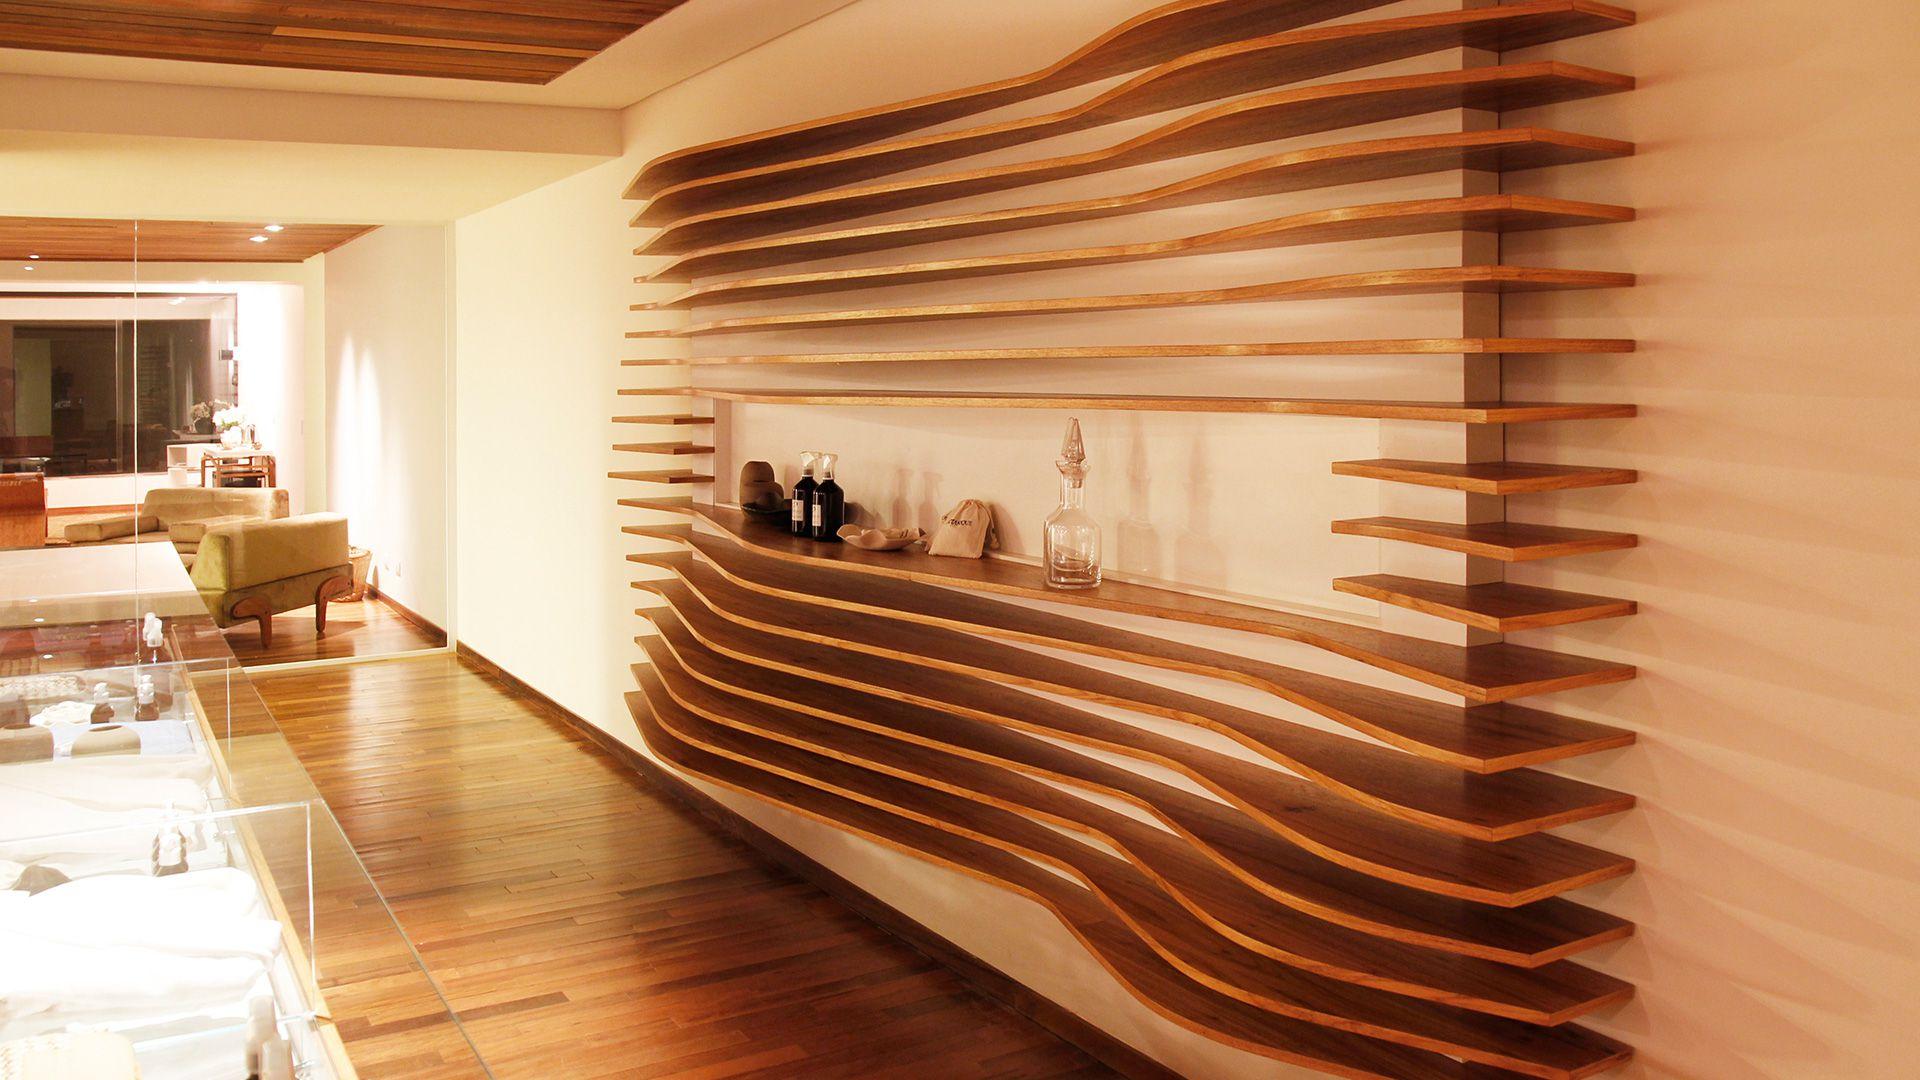 14-spa-hotel--botanique-foto-armario-boutique-vista-lateral